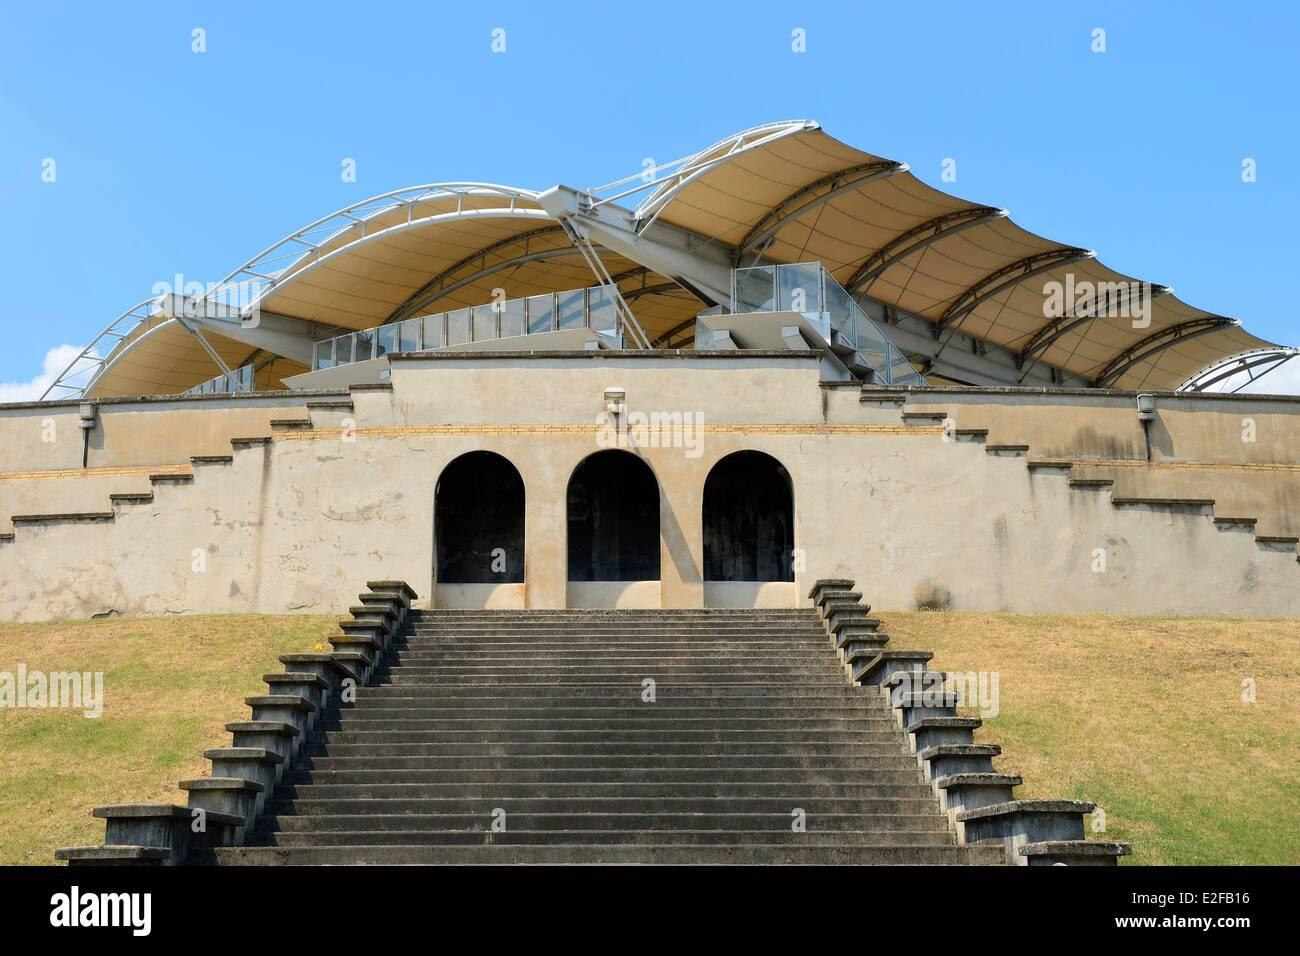 France, Rhone, Lyon, the Gerland stadium from the architect Tony Garnier Stock Photo